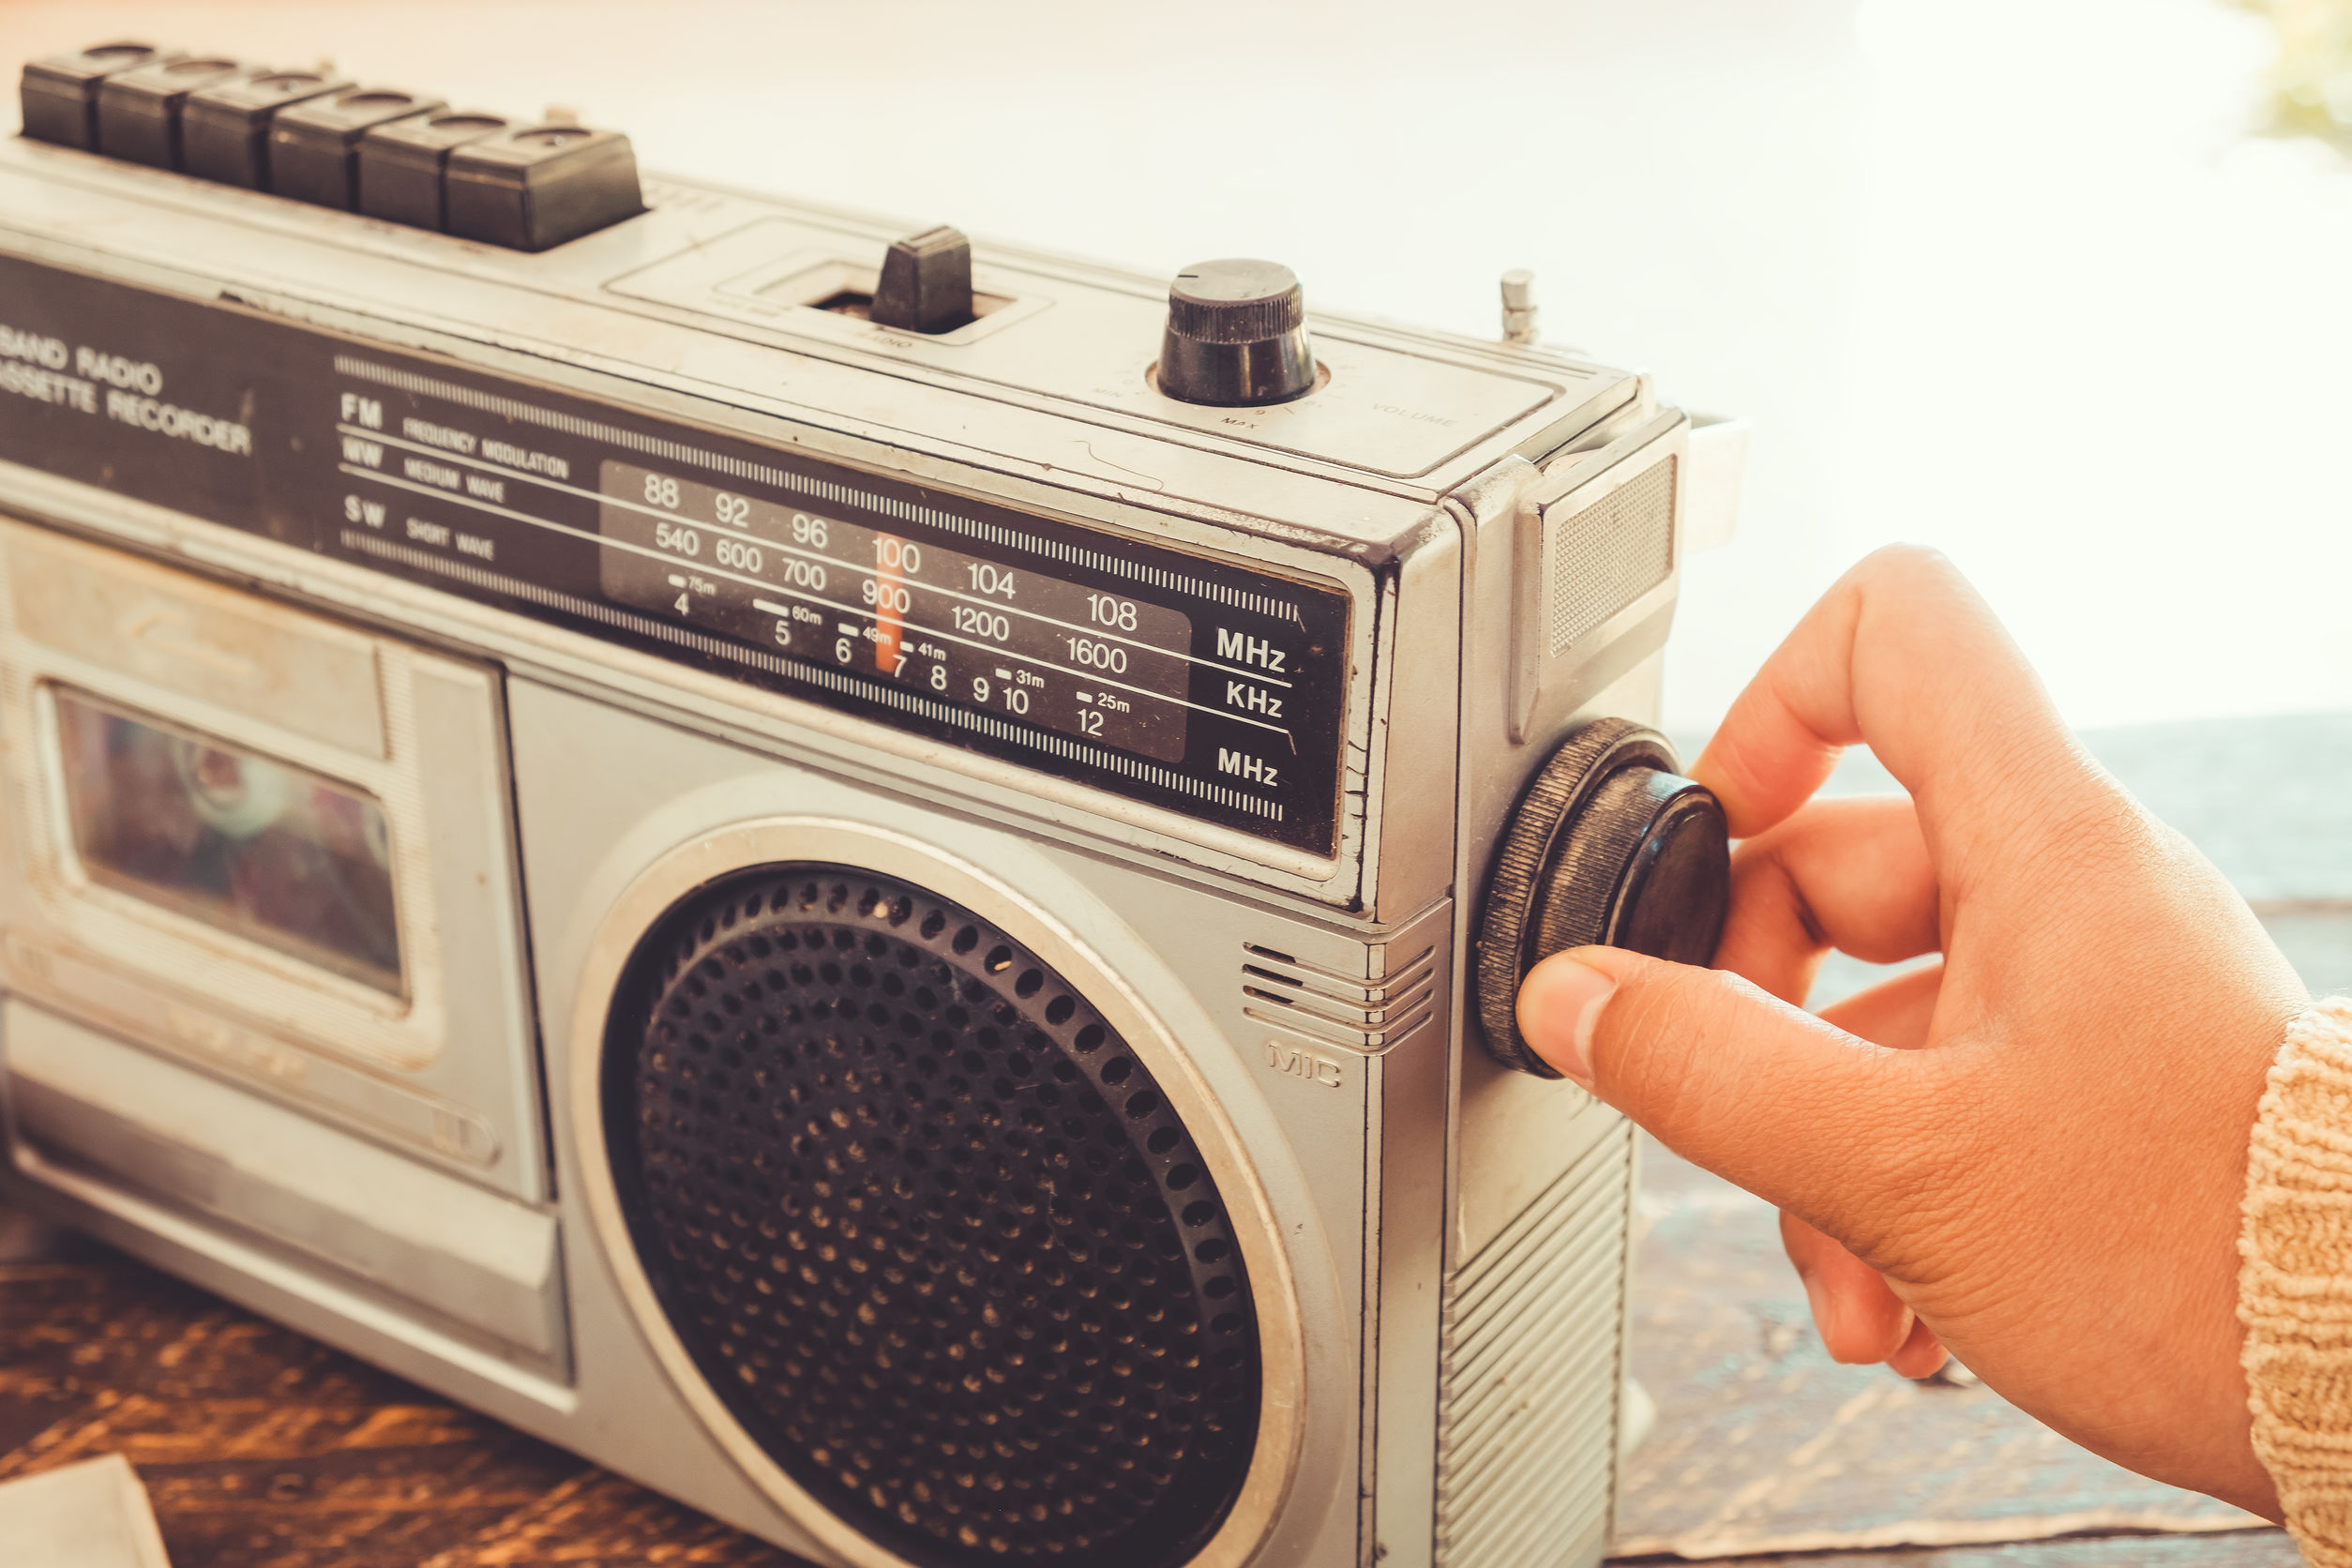 umy-radio-portátil-